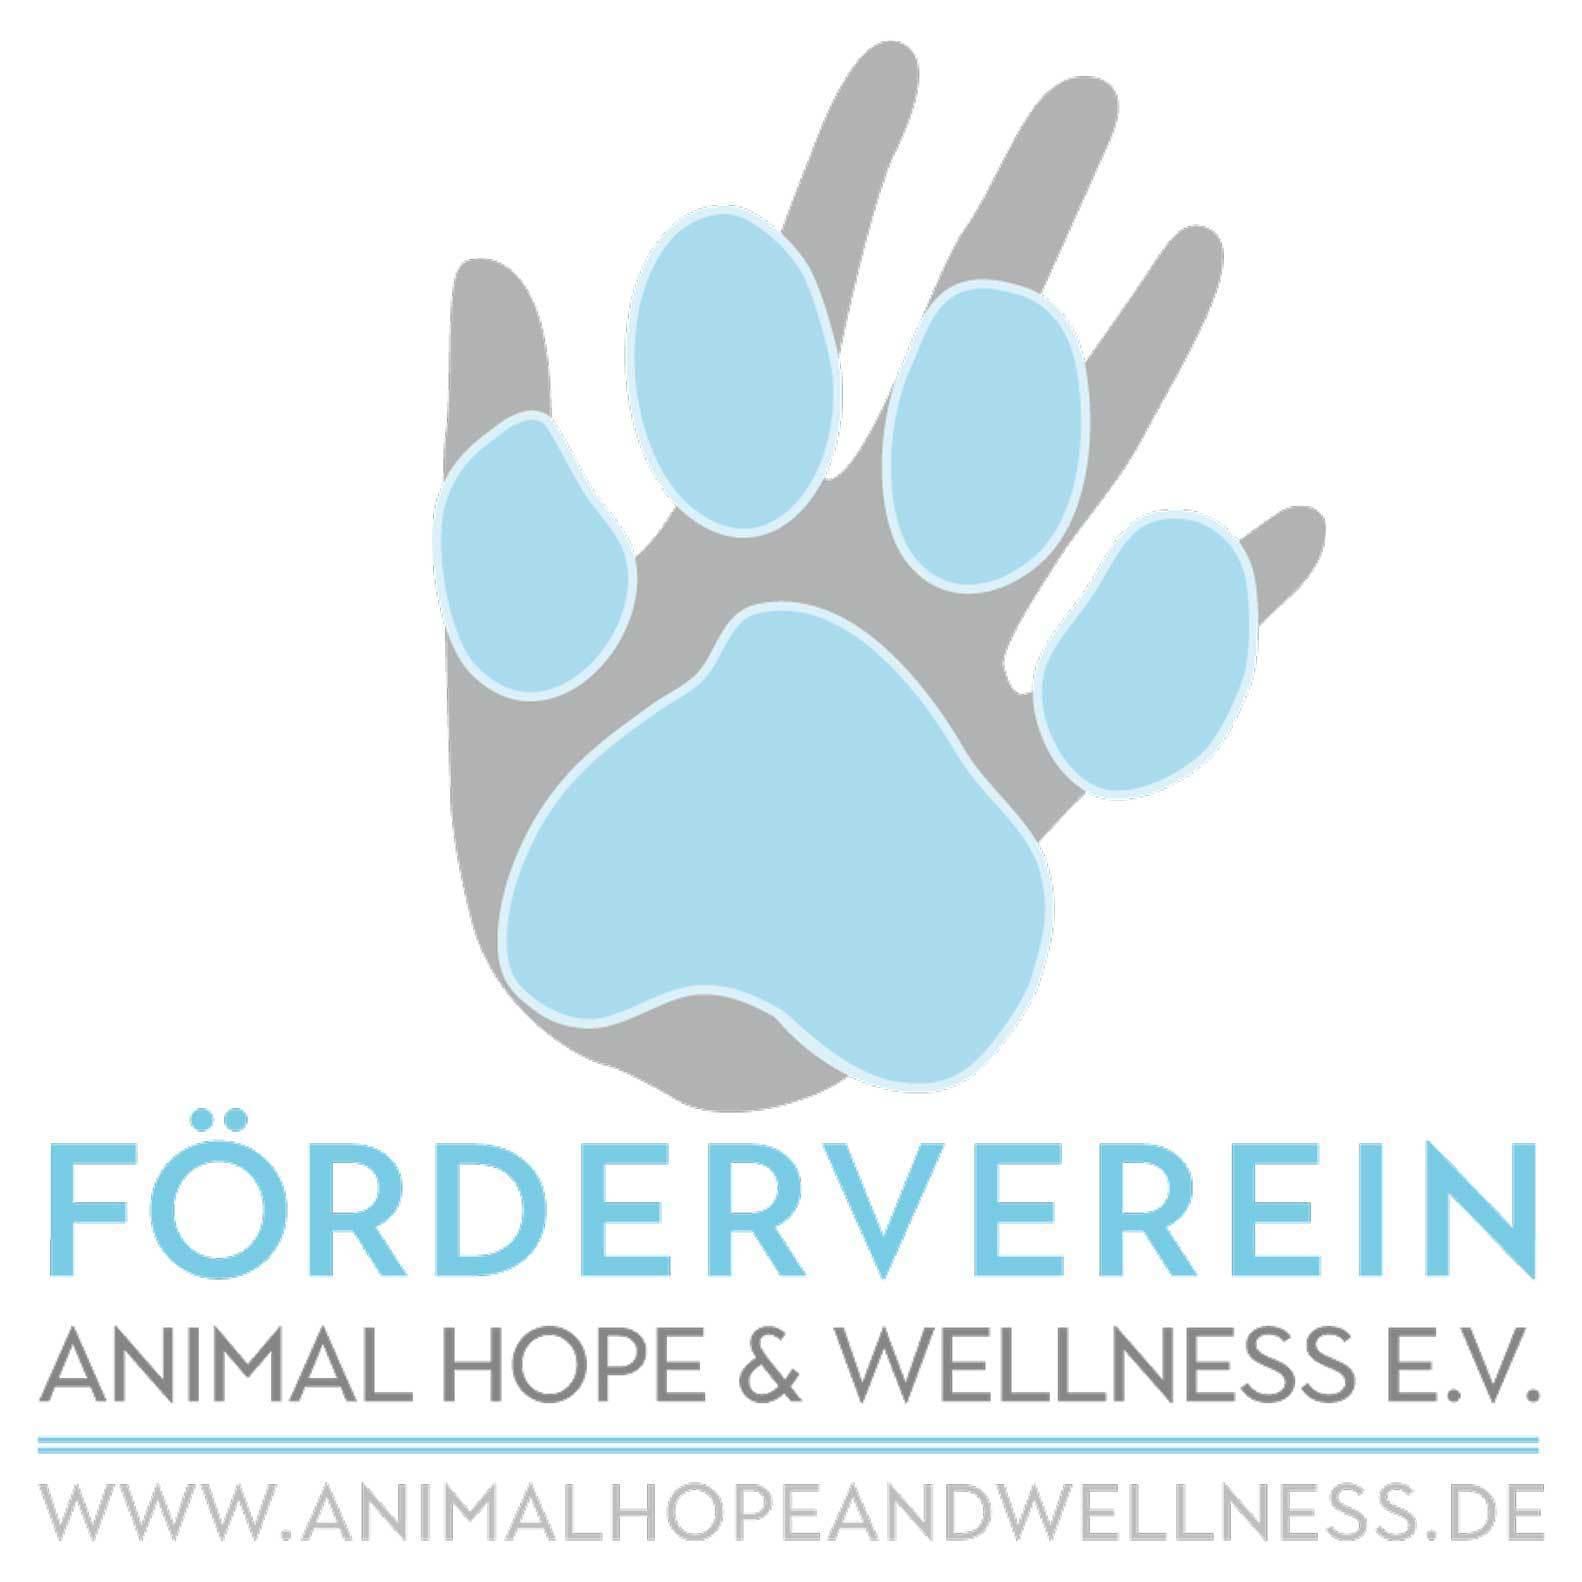 f rderverein animal hope and wellness e v spende f r unsere organisation. Black Bedroom Furniture Sets. Home Design Ideas